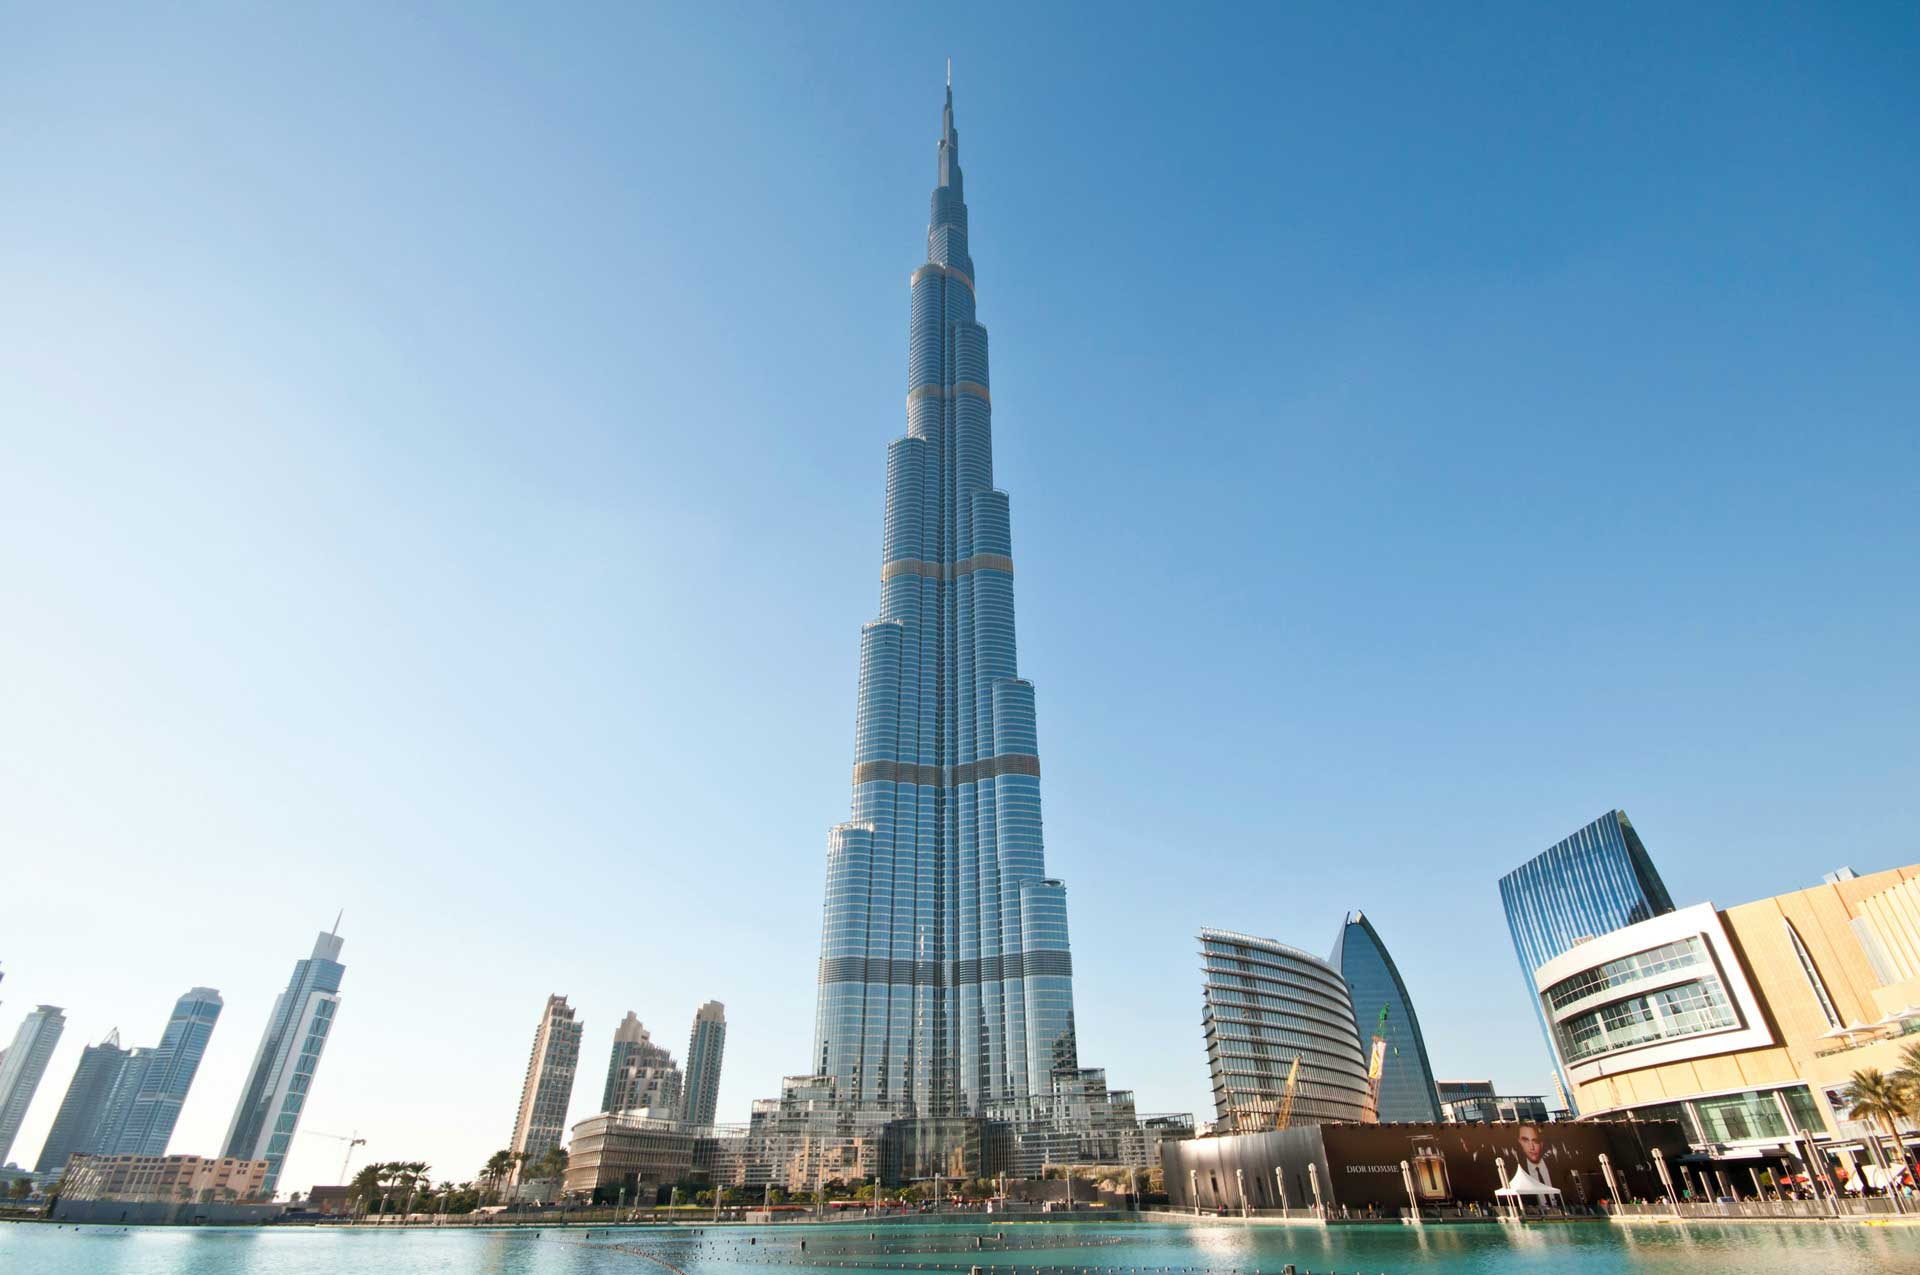 Burj Khalifa the Tallest Building